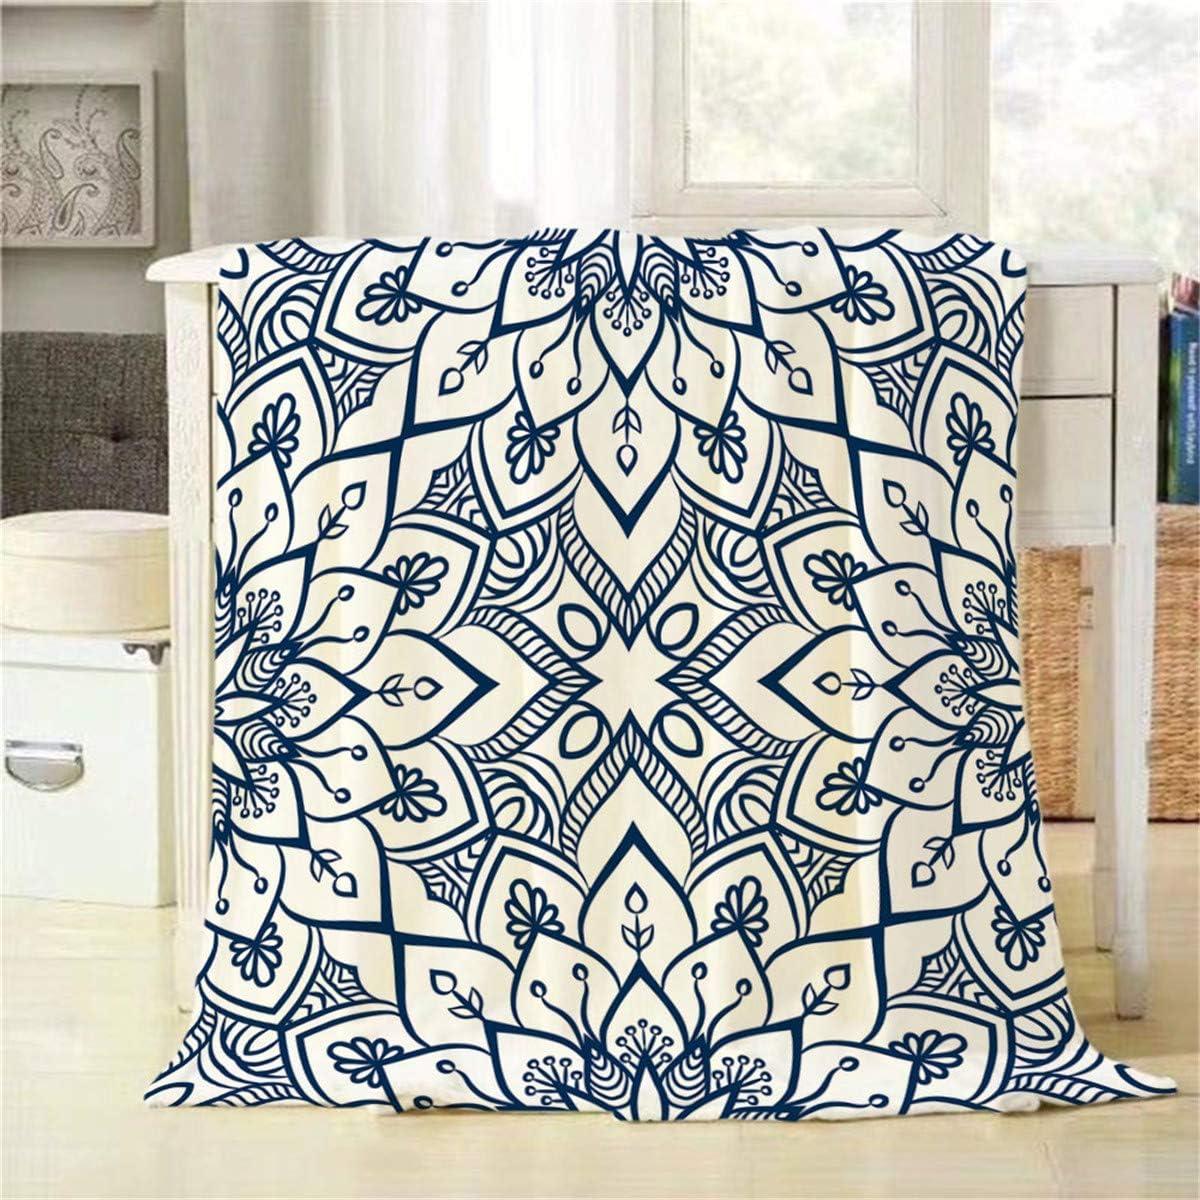 DSFAA Mandala Throw Blanket Motivos otomanos Indios Azules Patrón Floral Decorativo Suave Cálido Franela acogedora Mantas de Felpa Mantas para Ropa de Cama Sofá Sofá